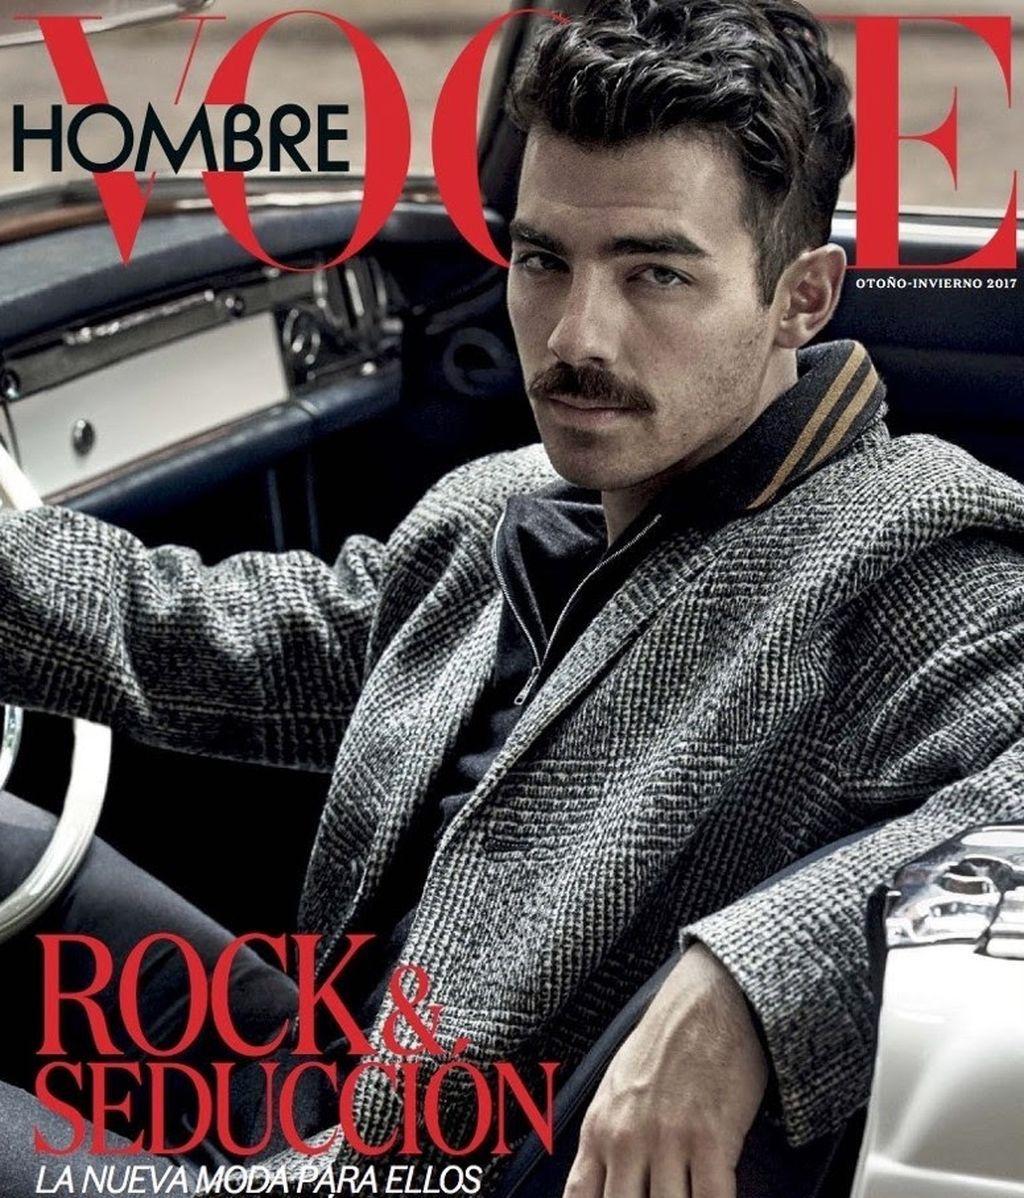 Joe-Jonas-2017-Vogue-Hombre-Cover-Photo-Shoot-001 (2)